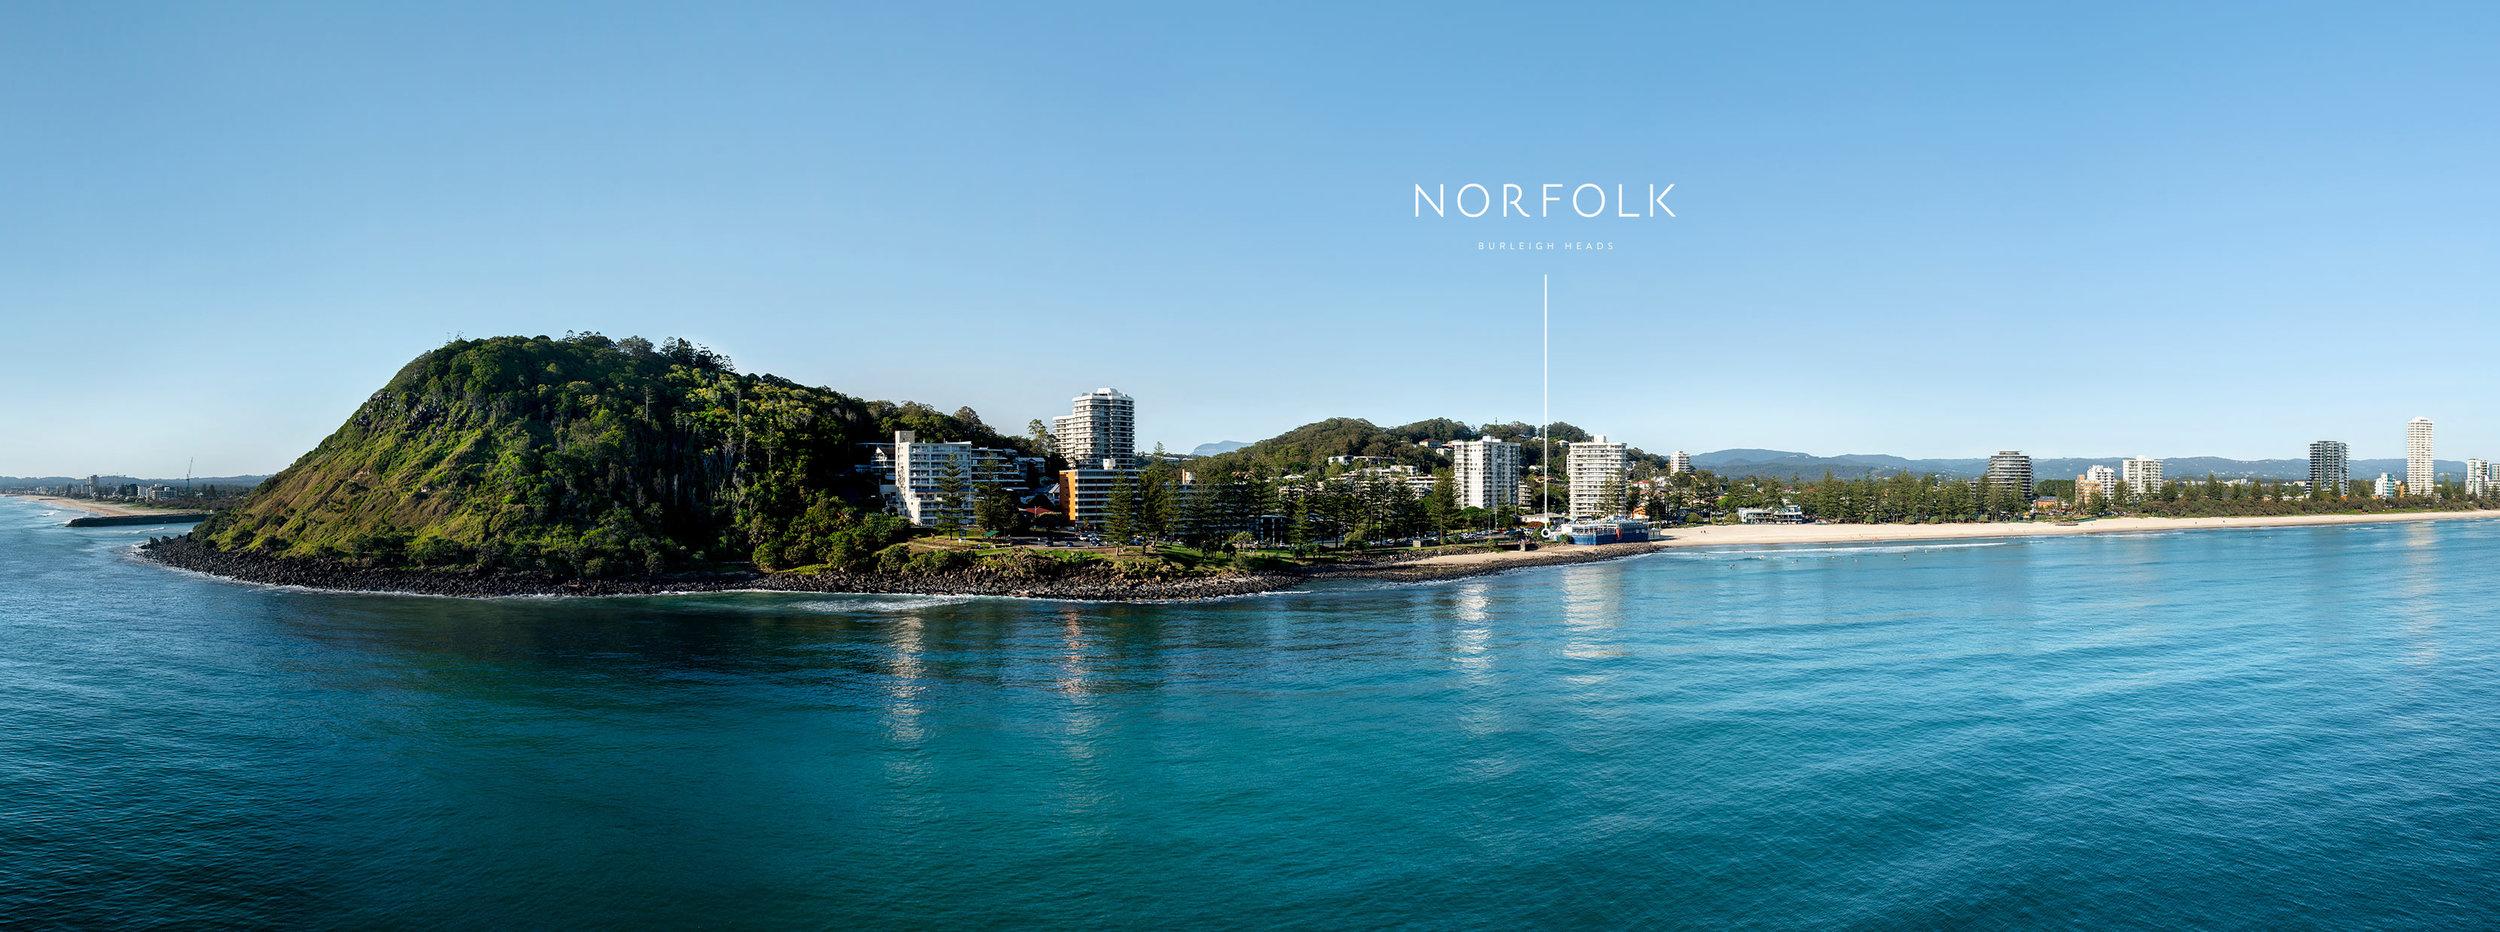 Norfolk-Burleigh-Heads-Location-Hero.jpg